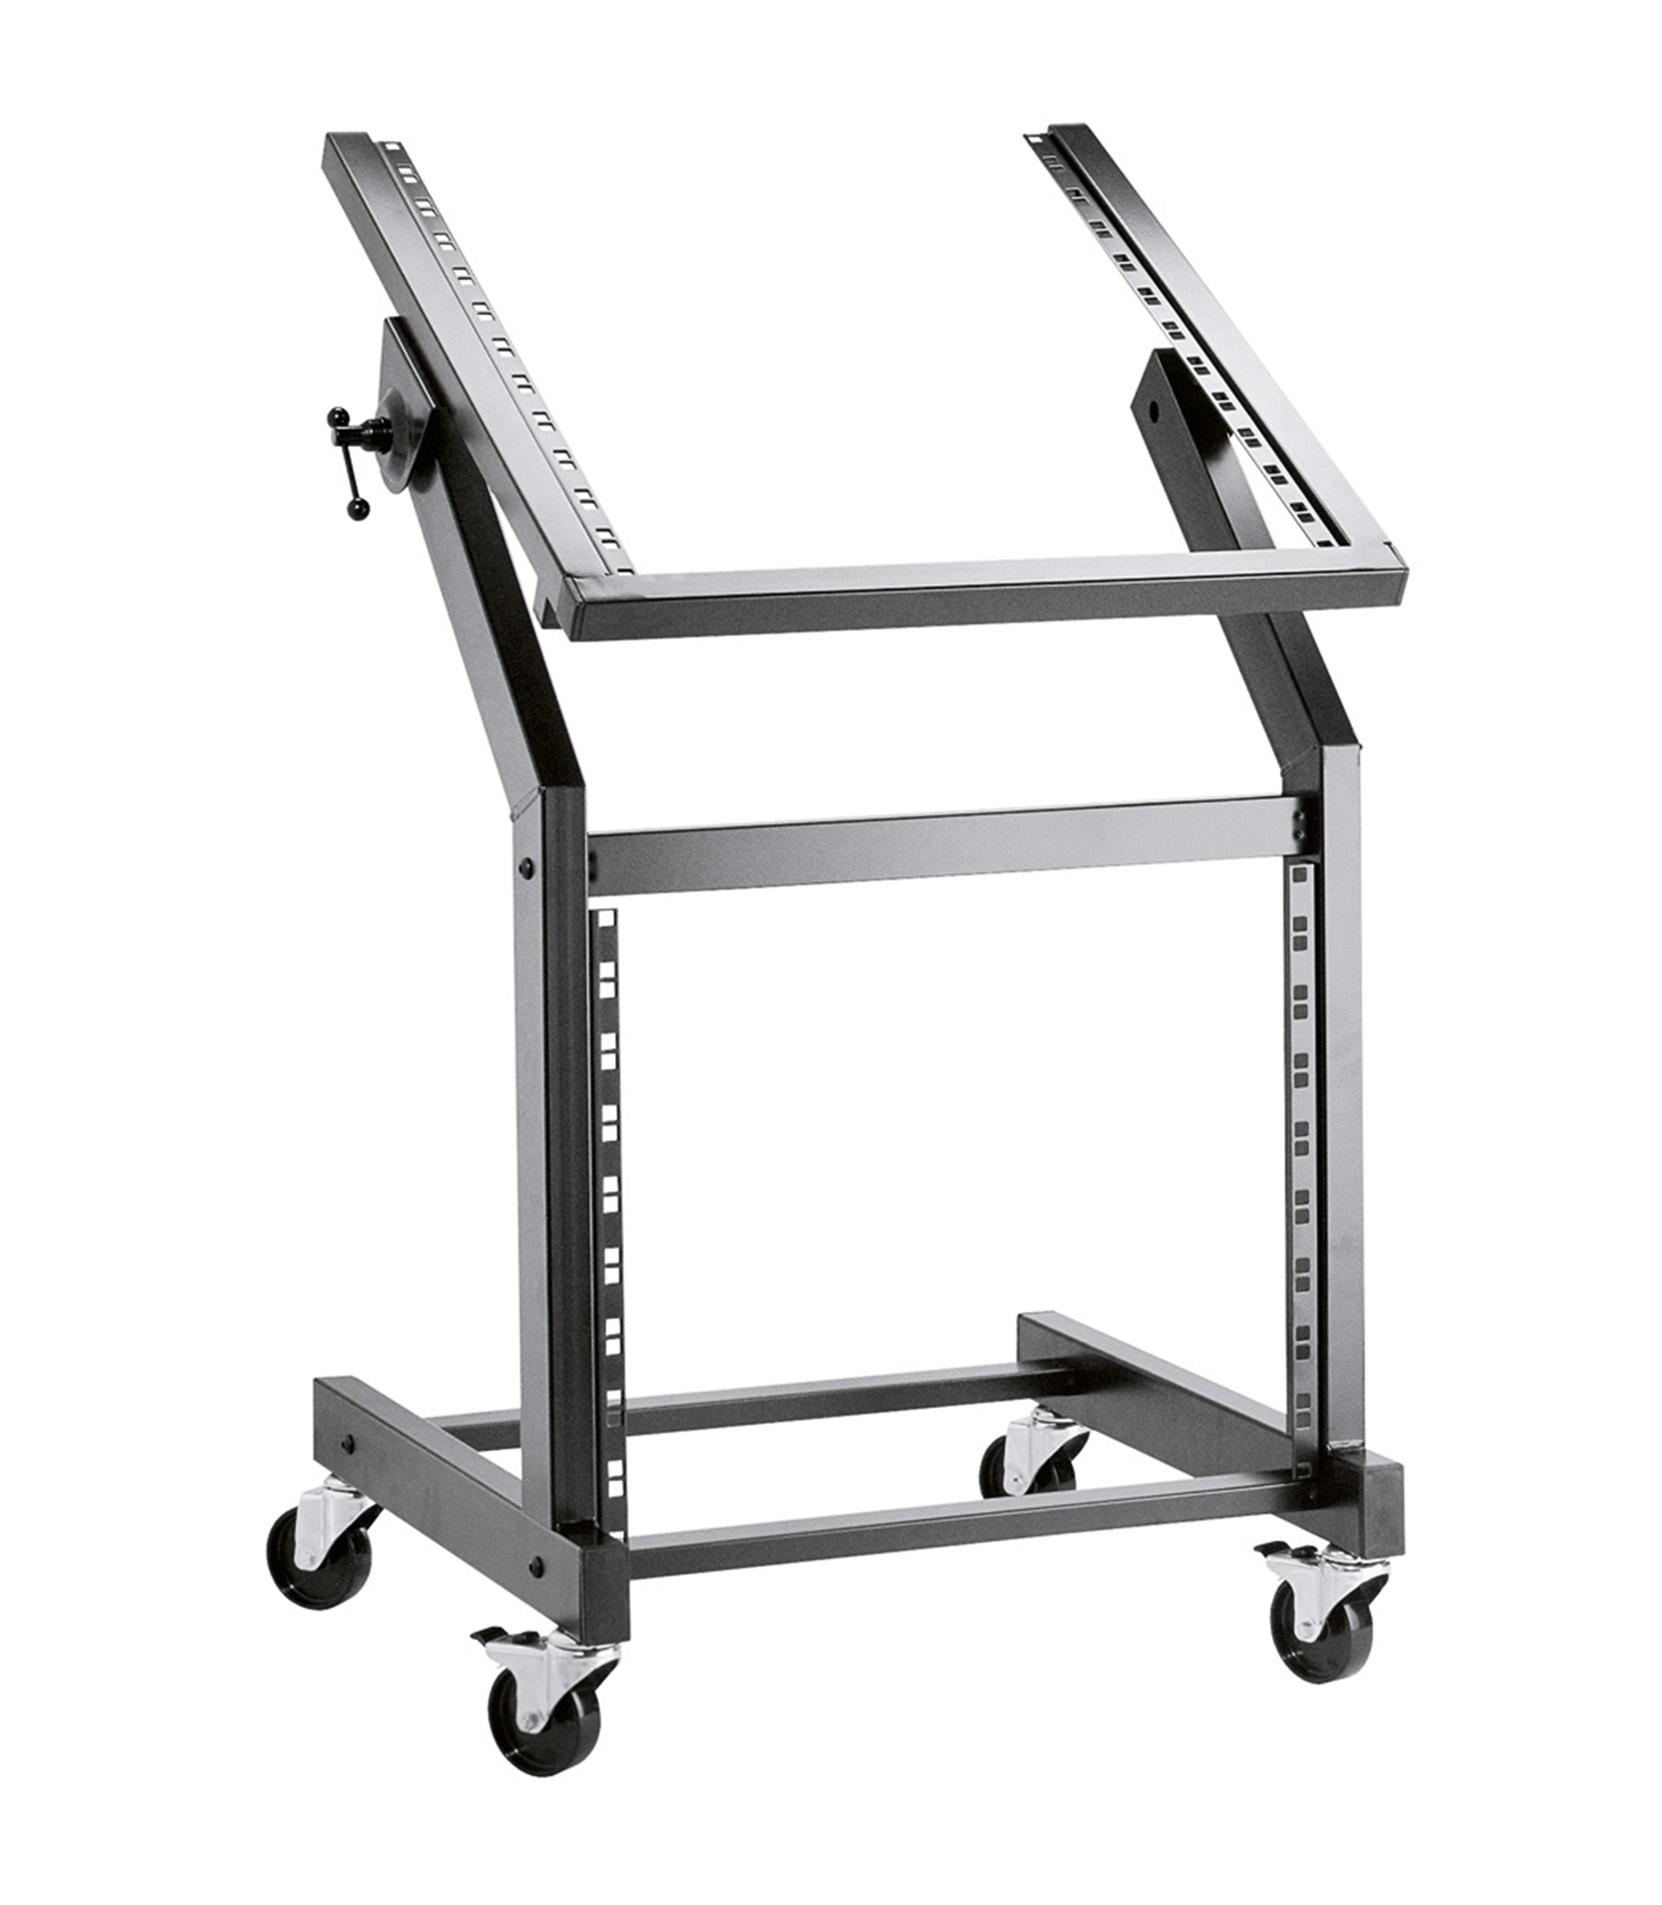 Buy K&M - 42020 Rack Wagon Black